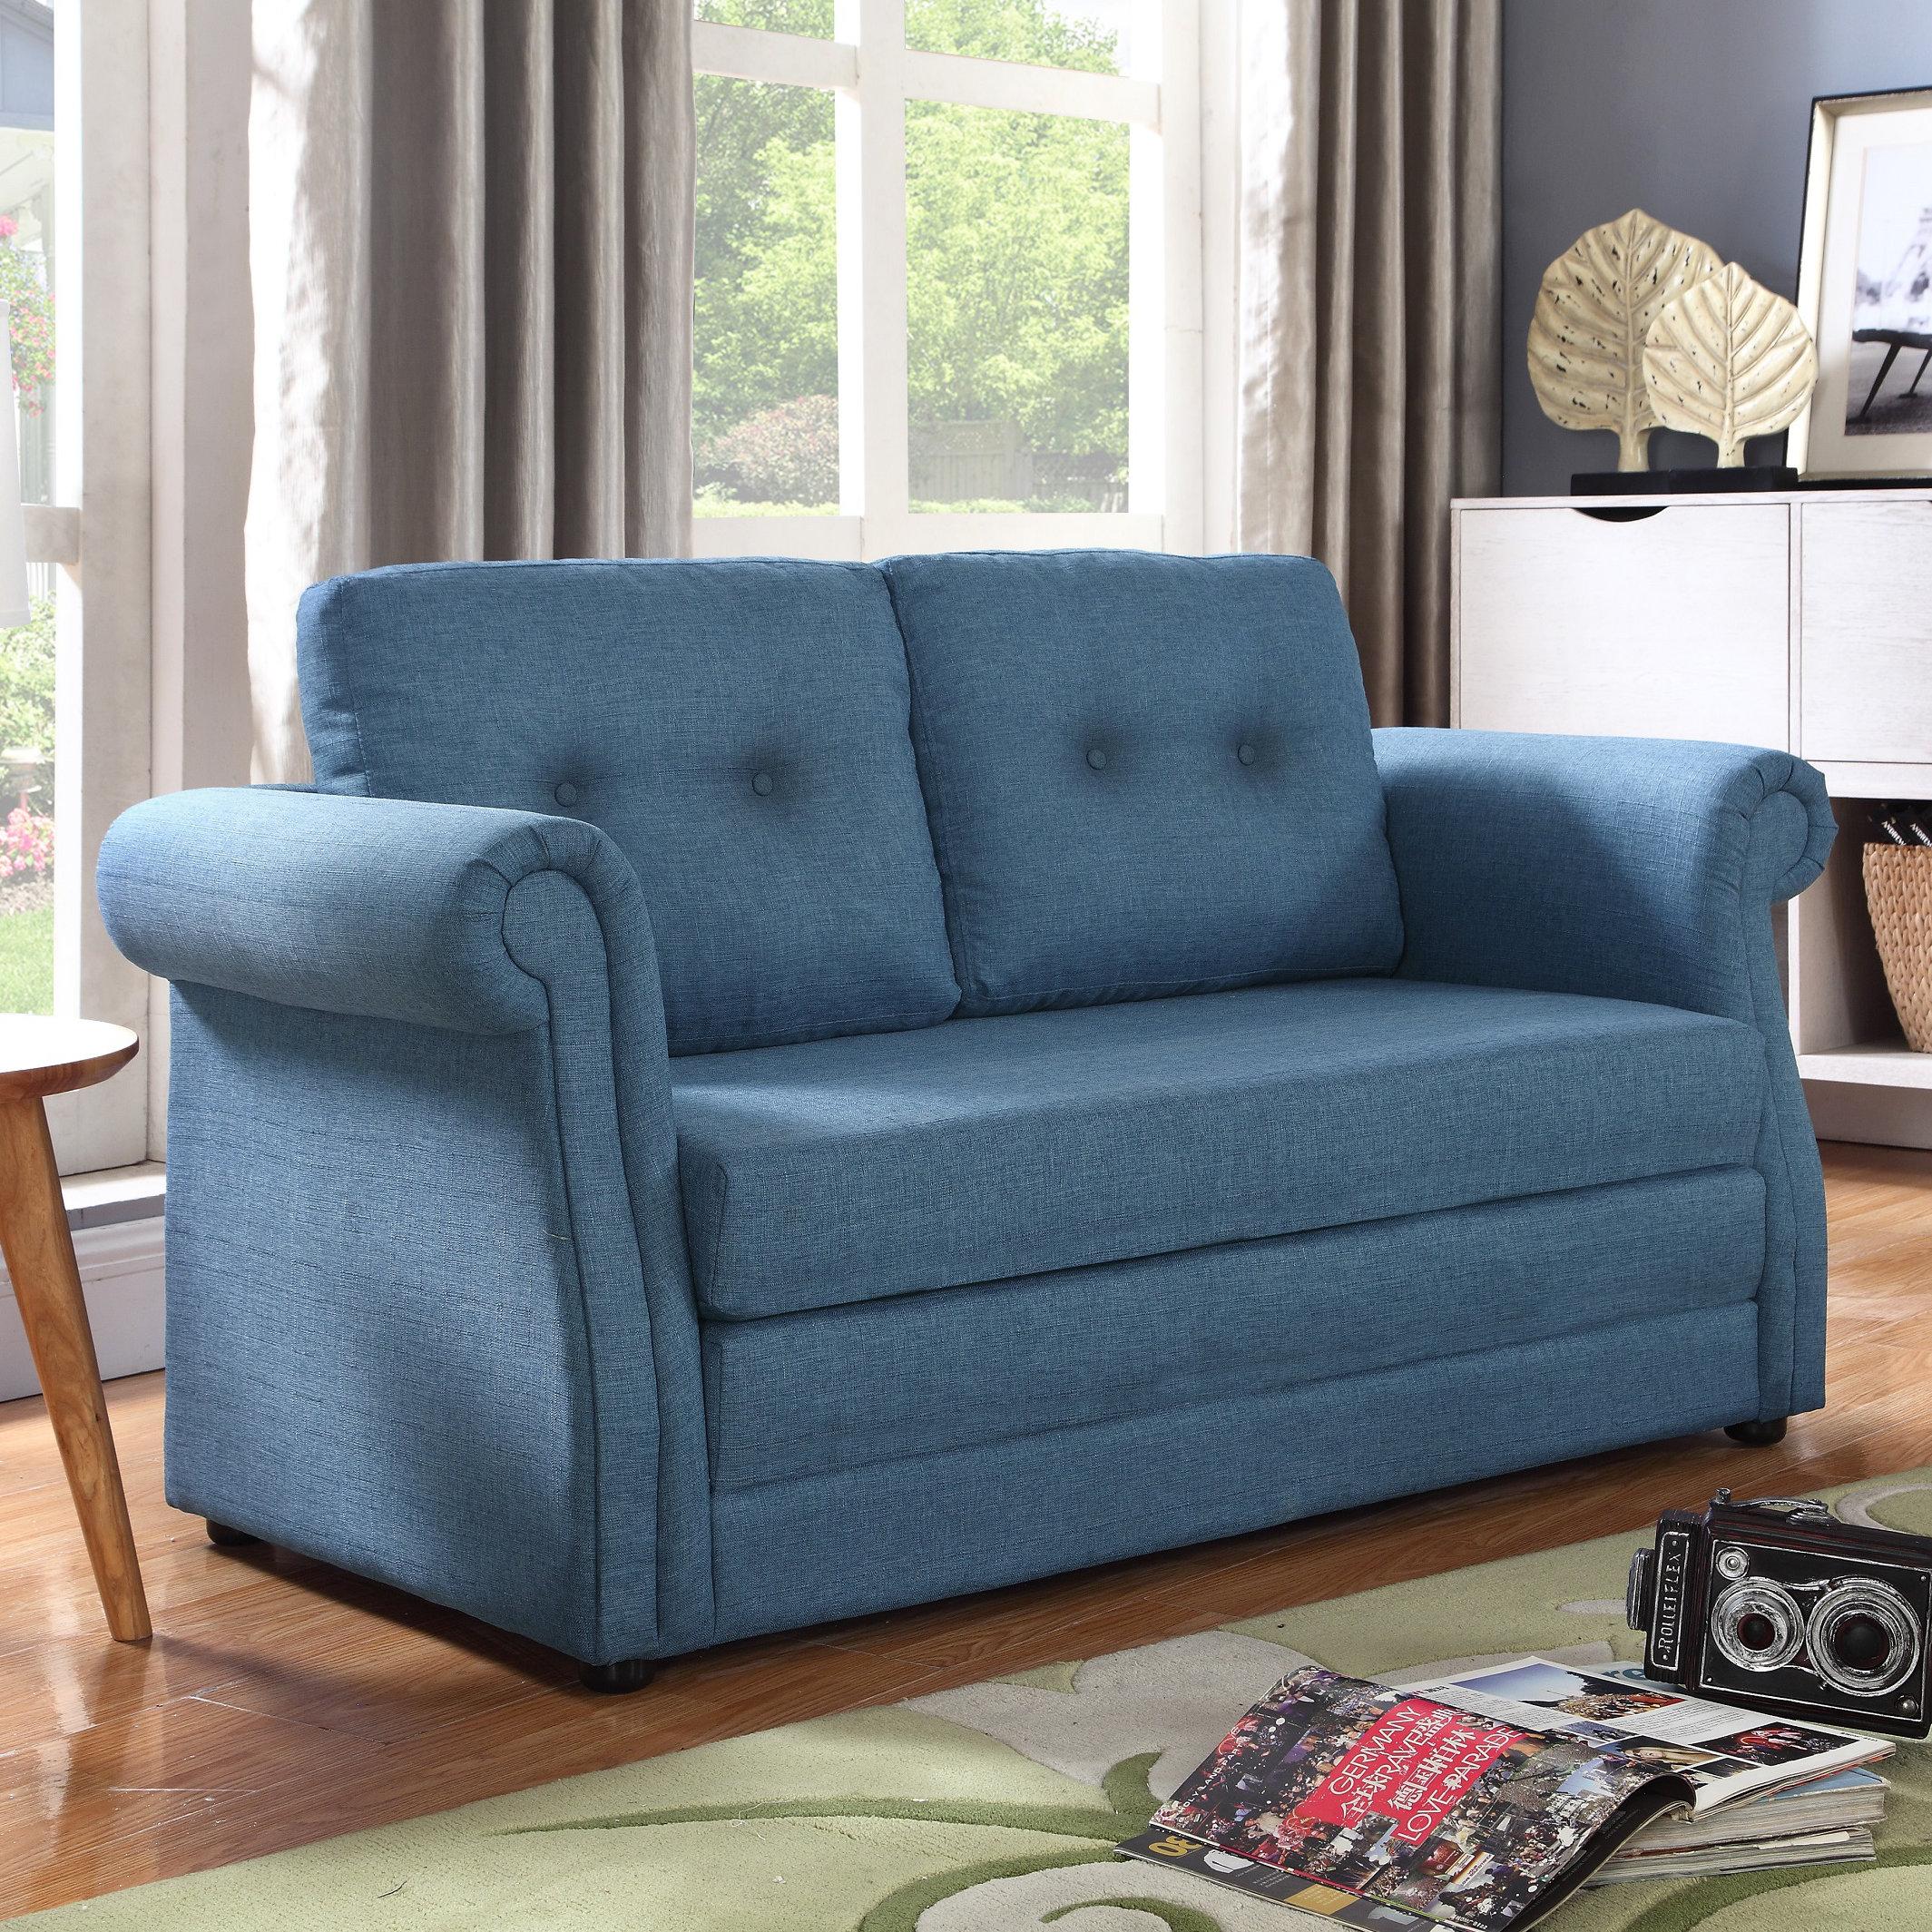 Container Sleeper Sofa & Reviews | Wayfair